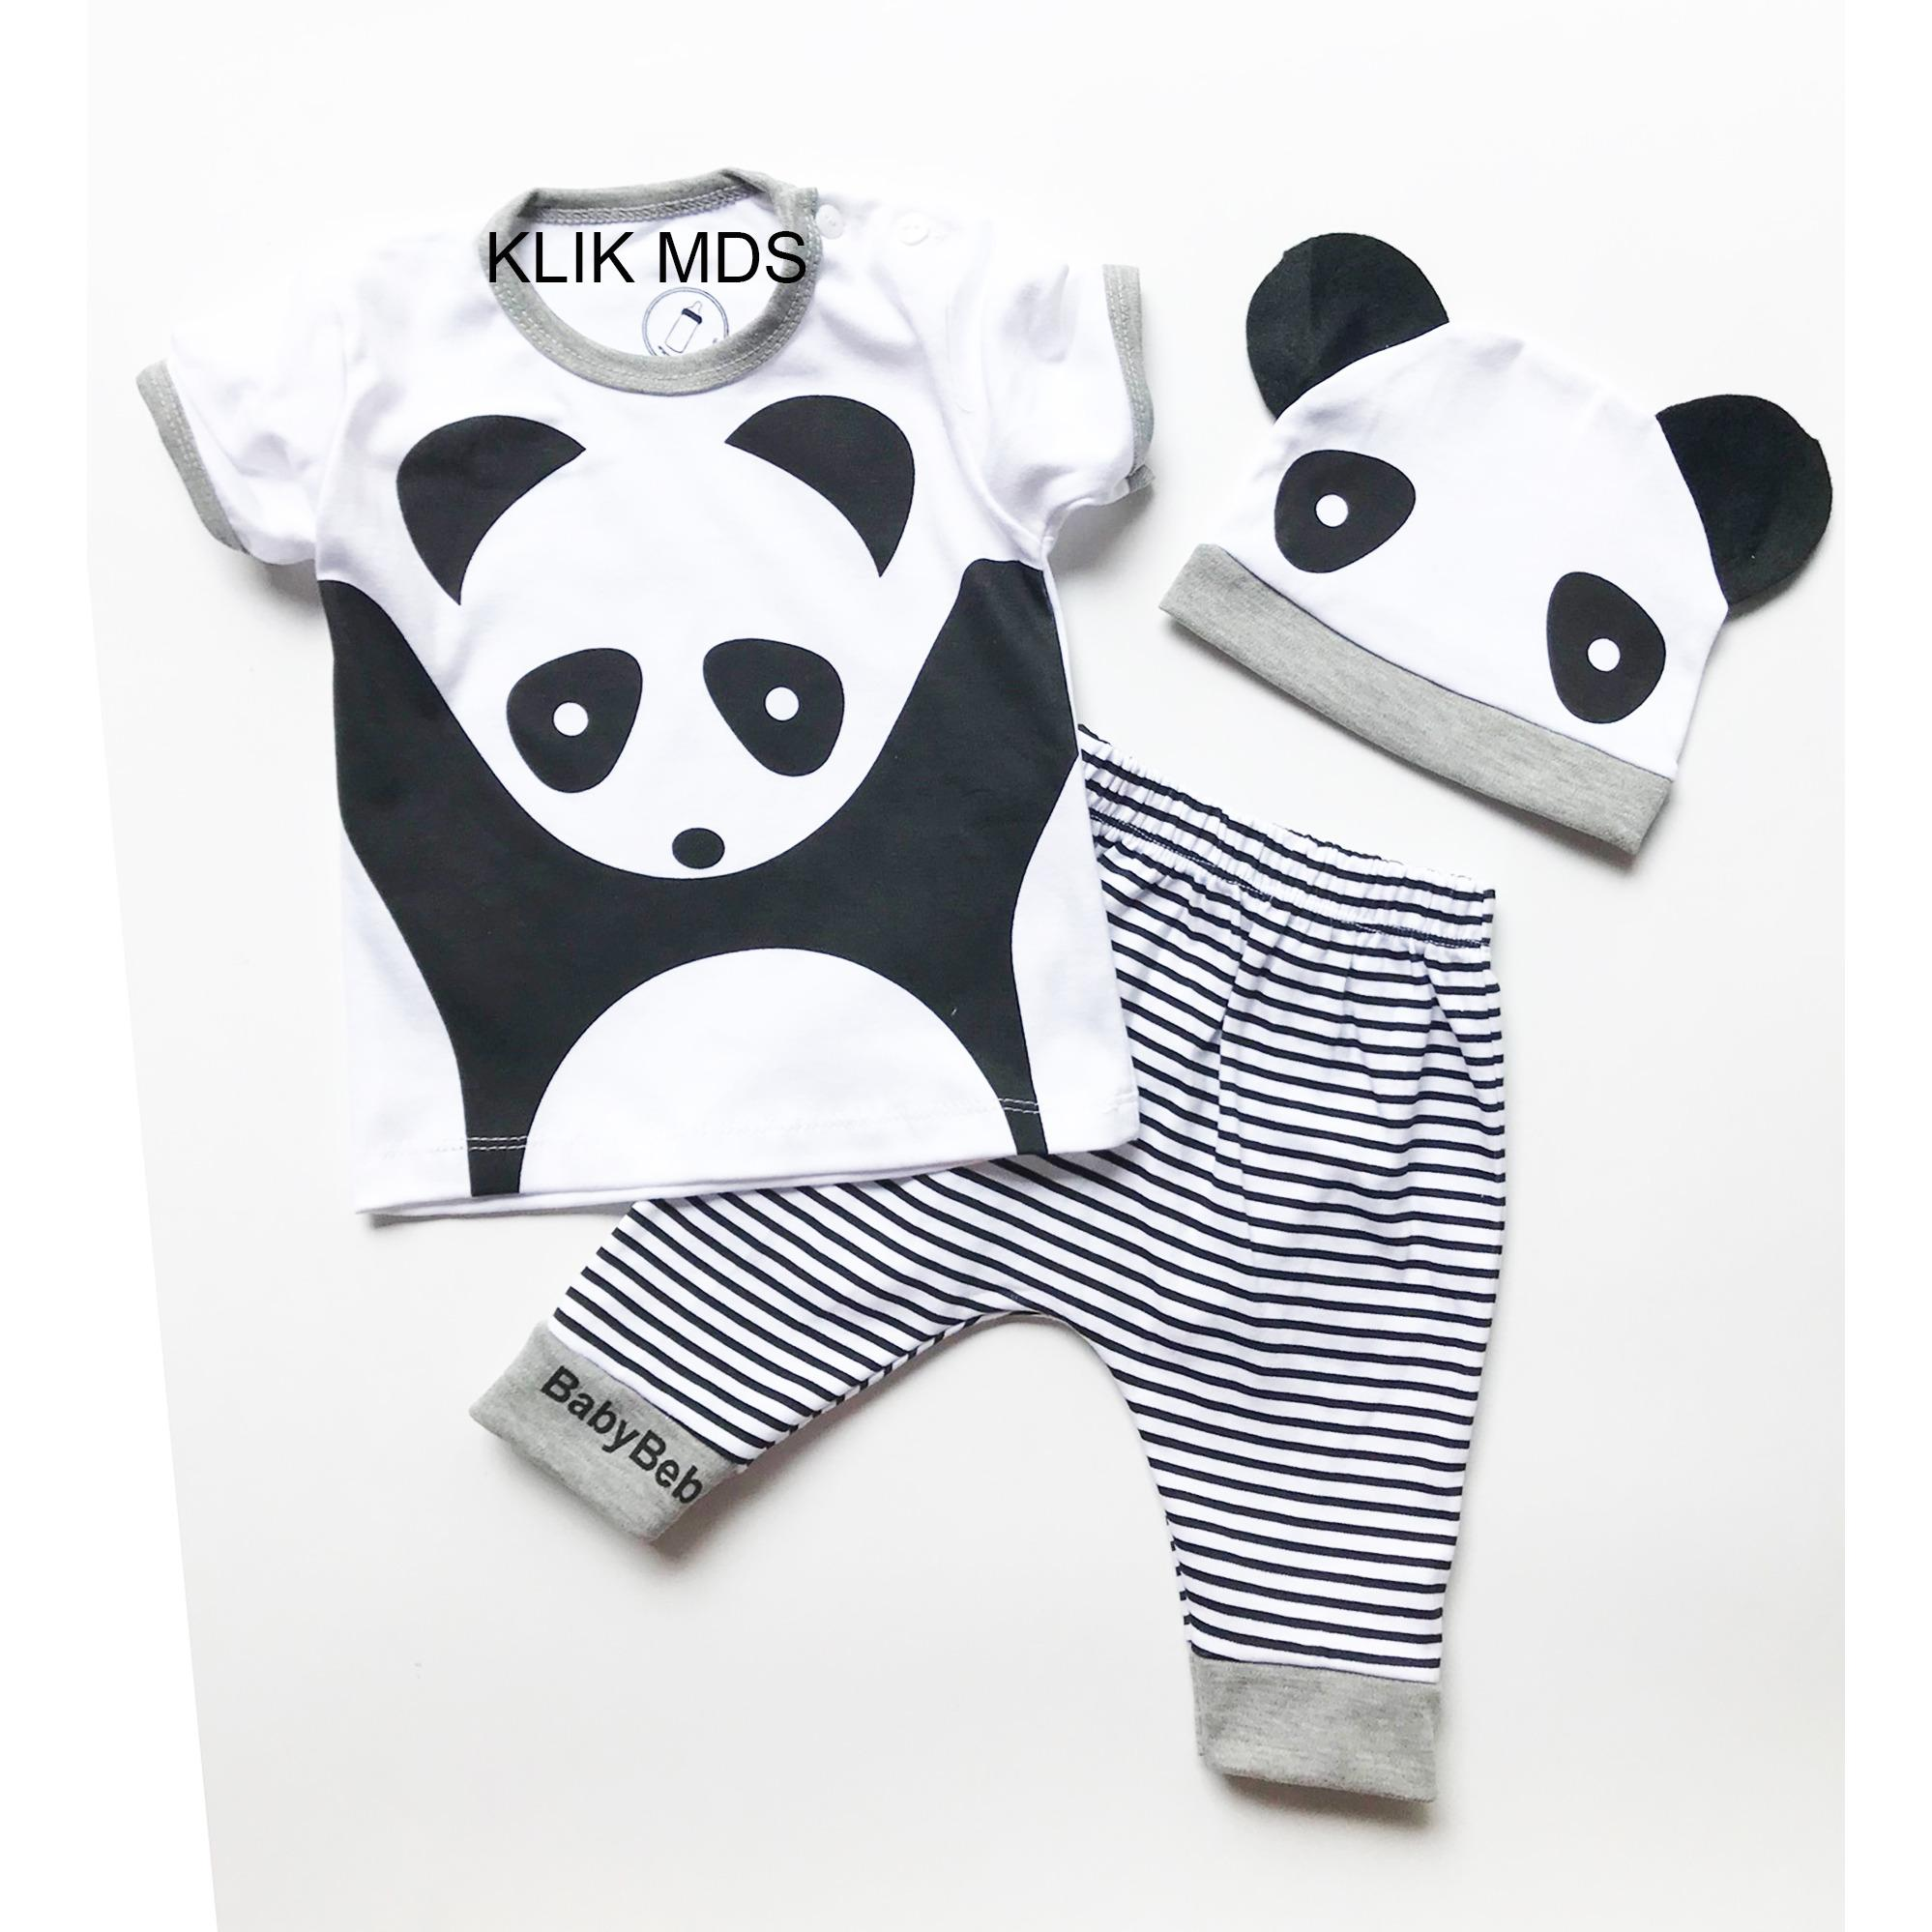 Penawaran 6 Pcs Bedong Bayi Lembut Bermotif Lucu Harga Grosir Toko Baju Karakter Anak Setelan Atasan Dan Celana Motif Panda Free Topi